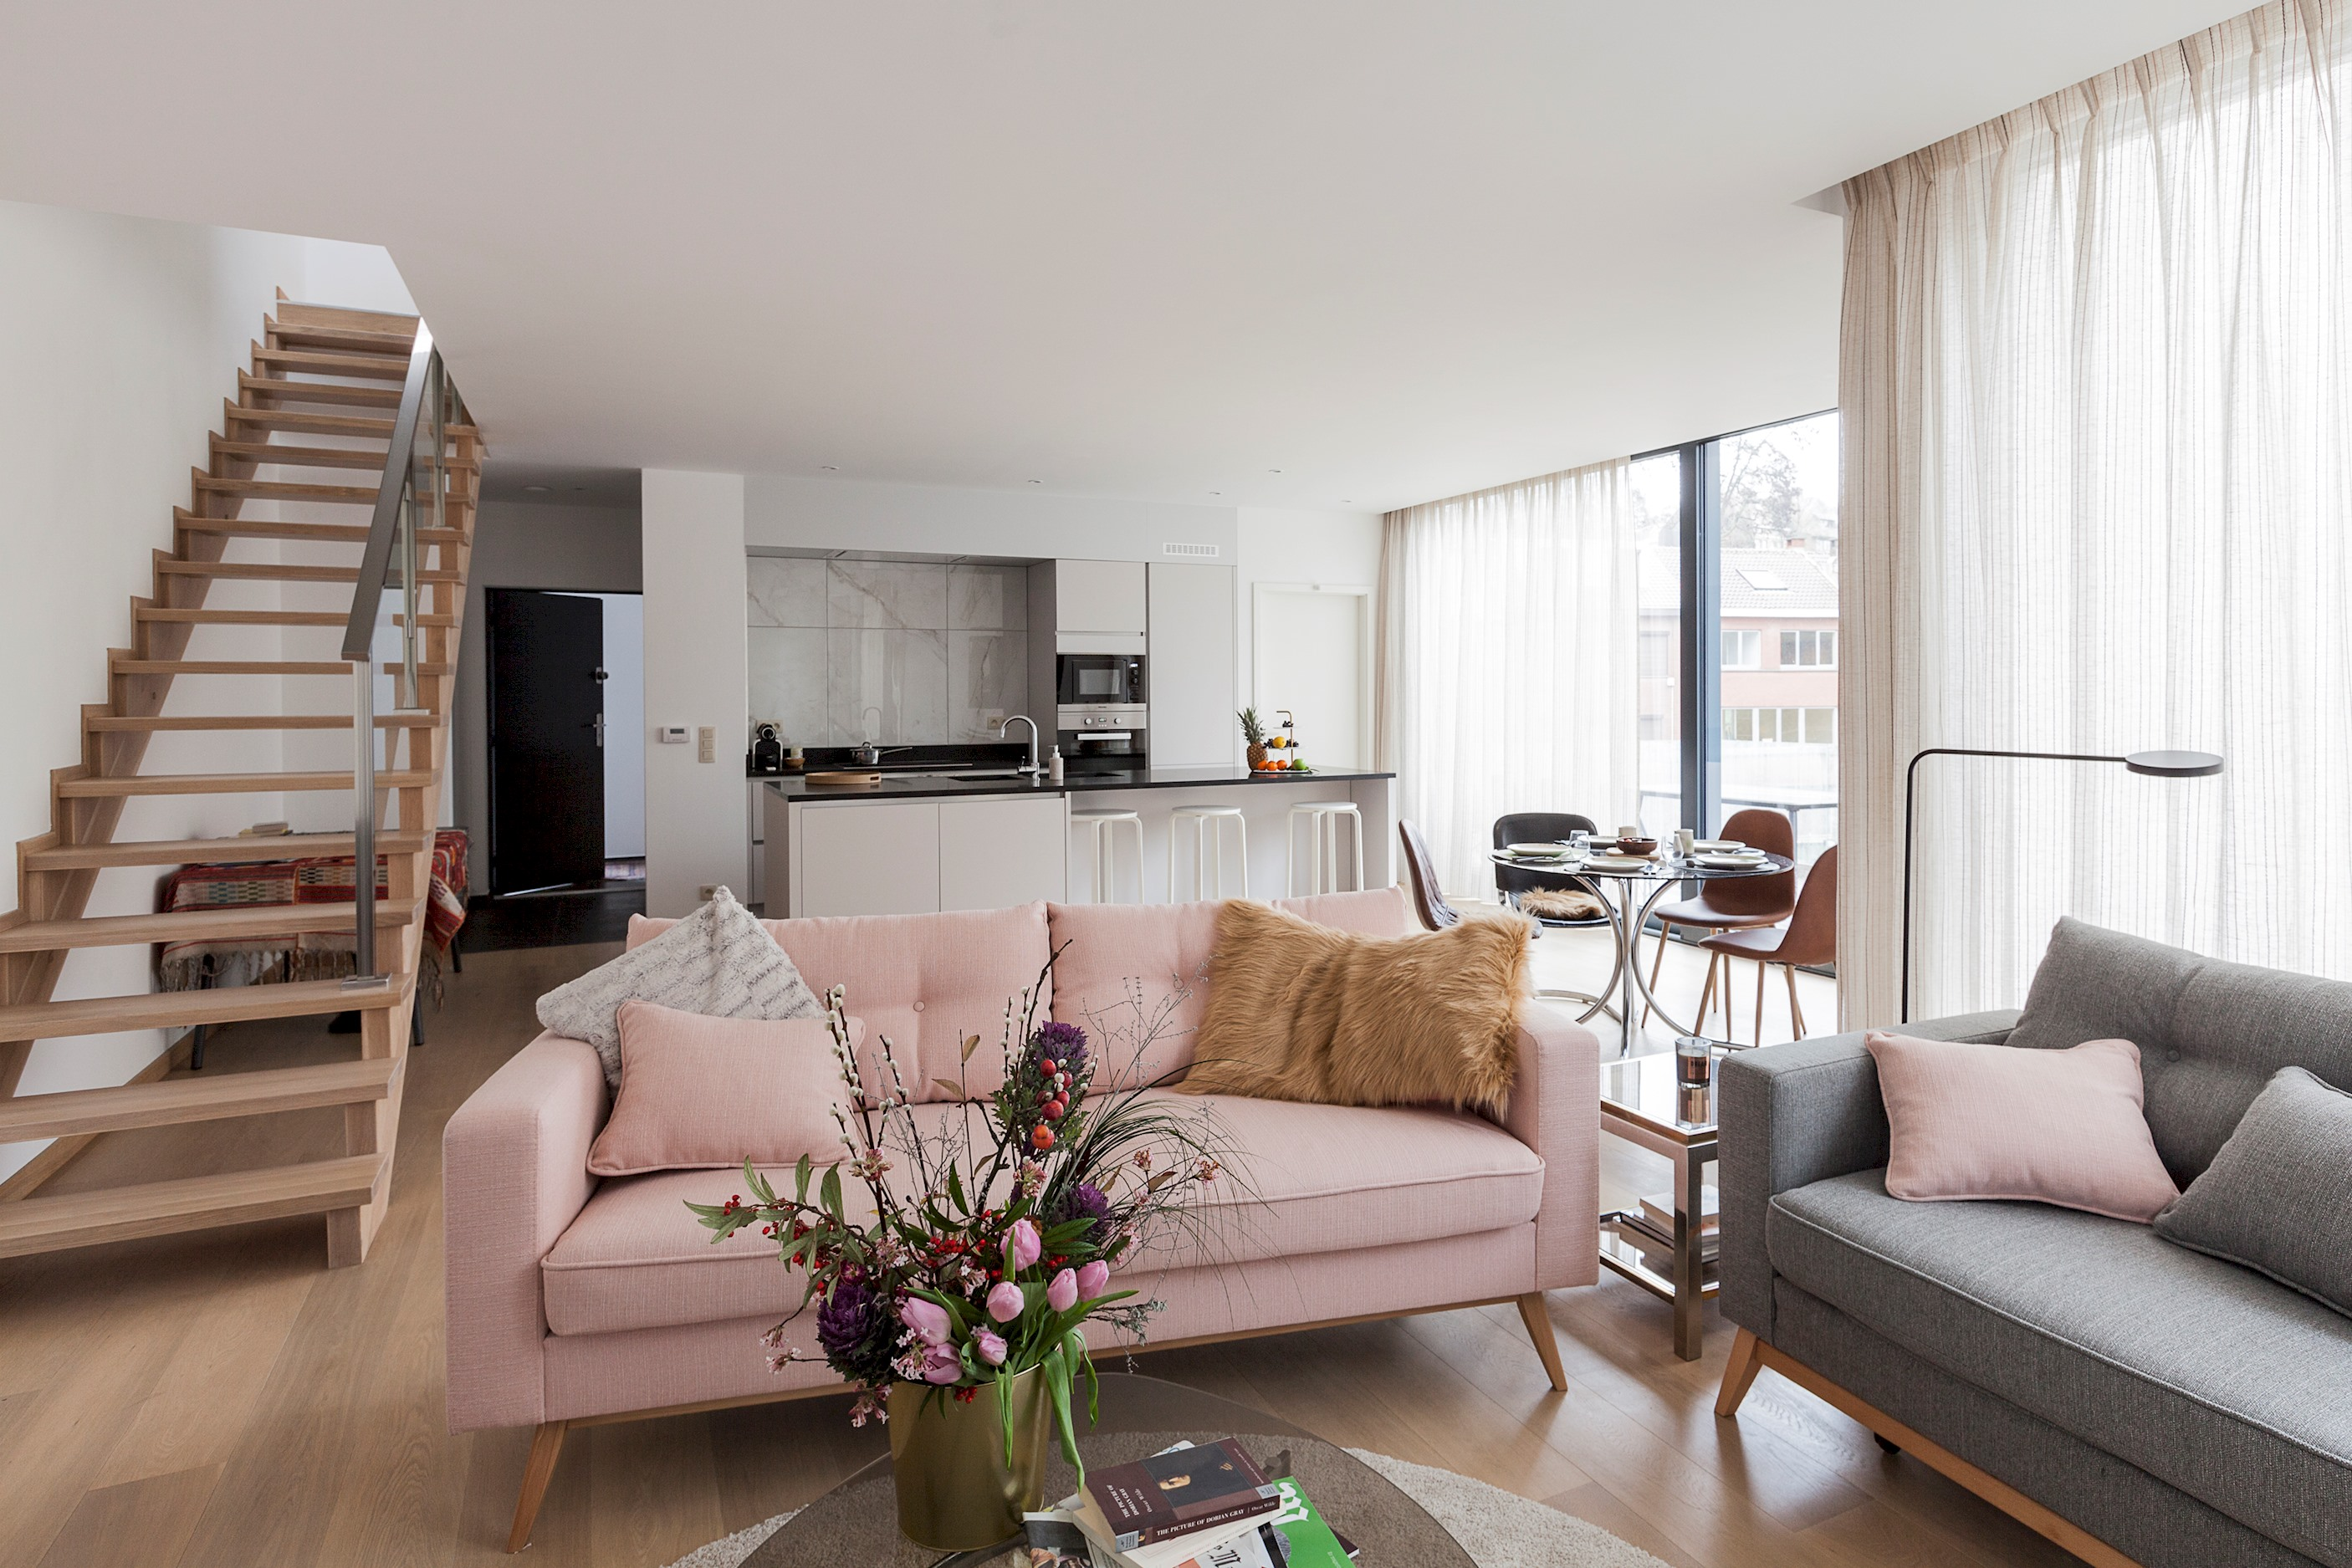 Unit 2 - Modern Smart Home Duplex with free Parking 0